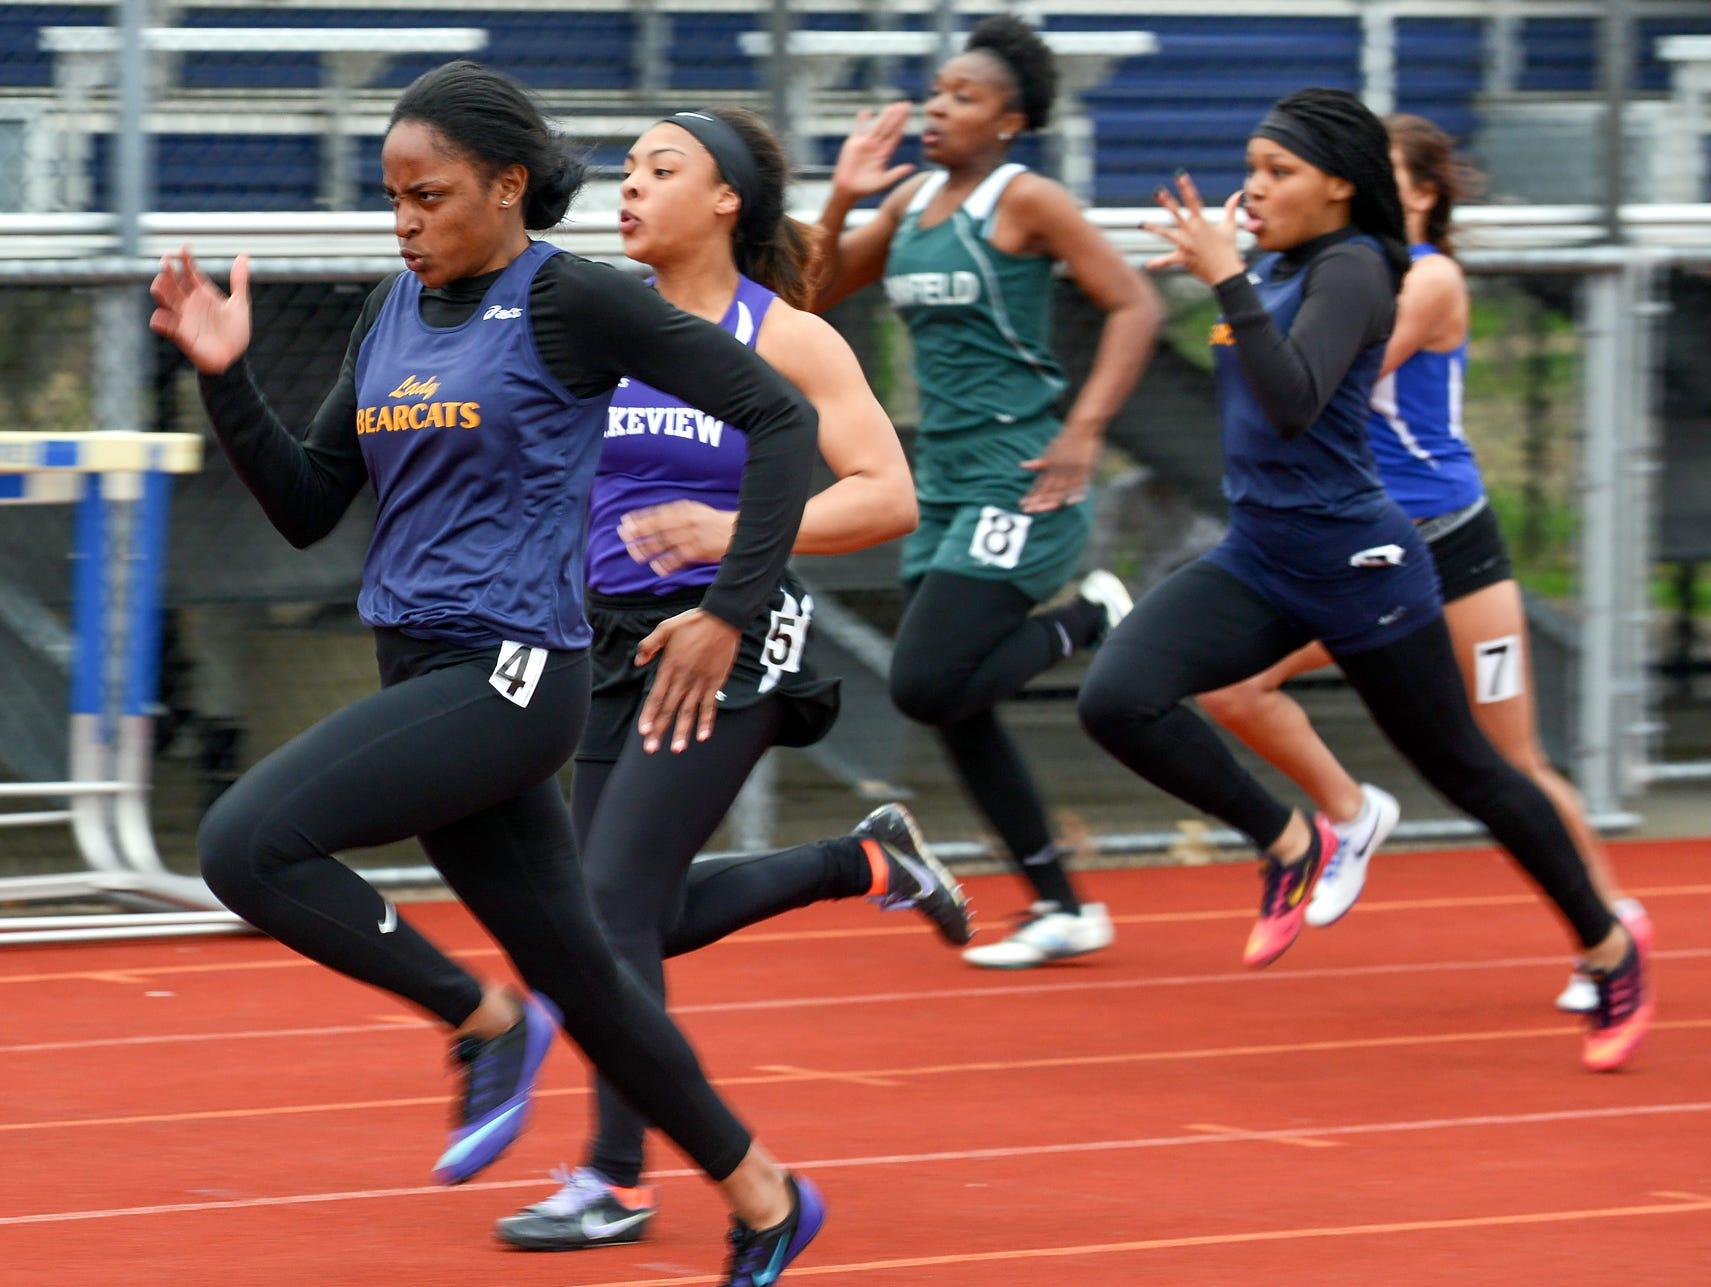 2016 All City Track Meet - 100 meter dash.